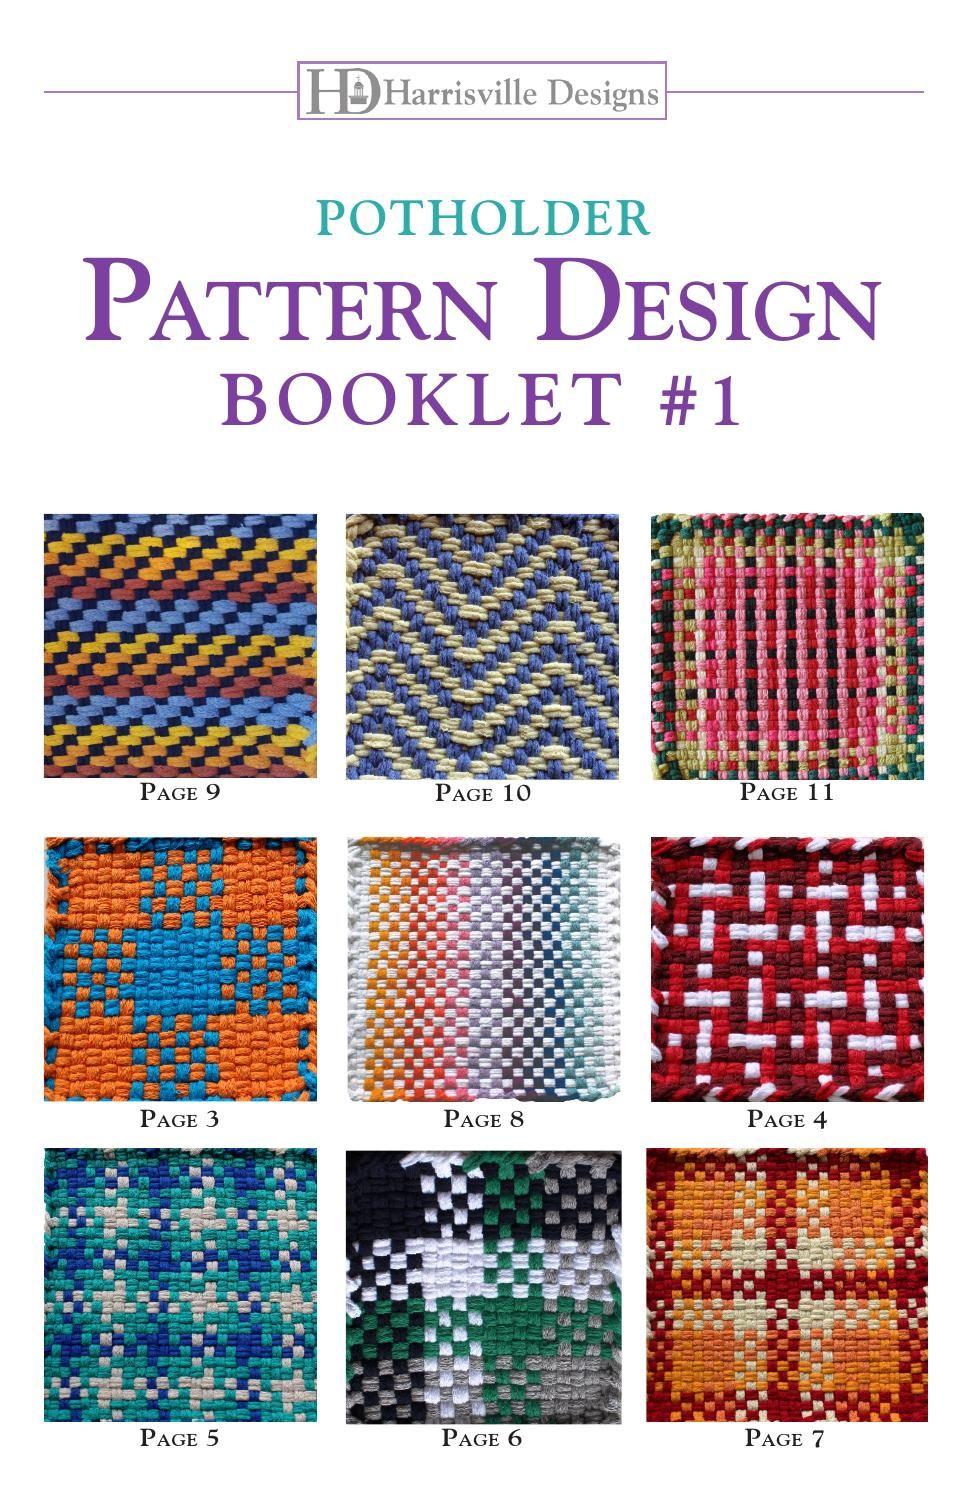 Potholder Pattern Booklet 1 Potholders